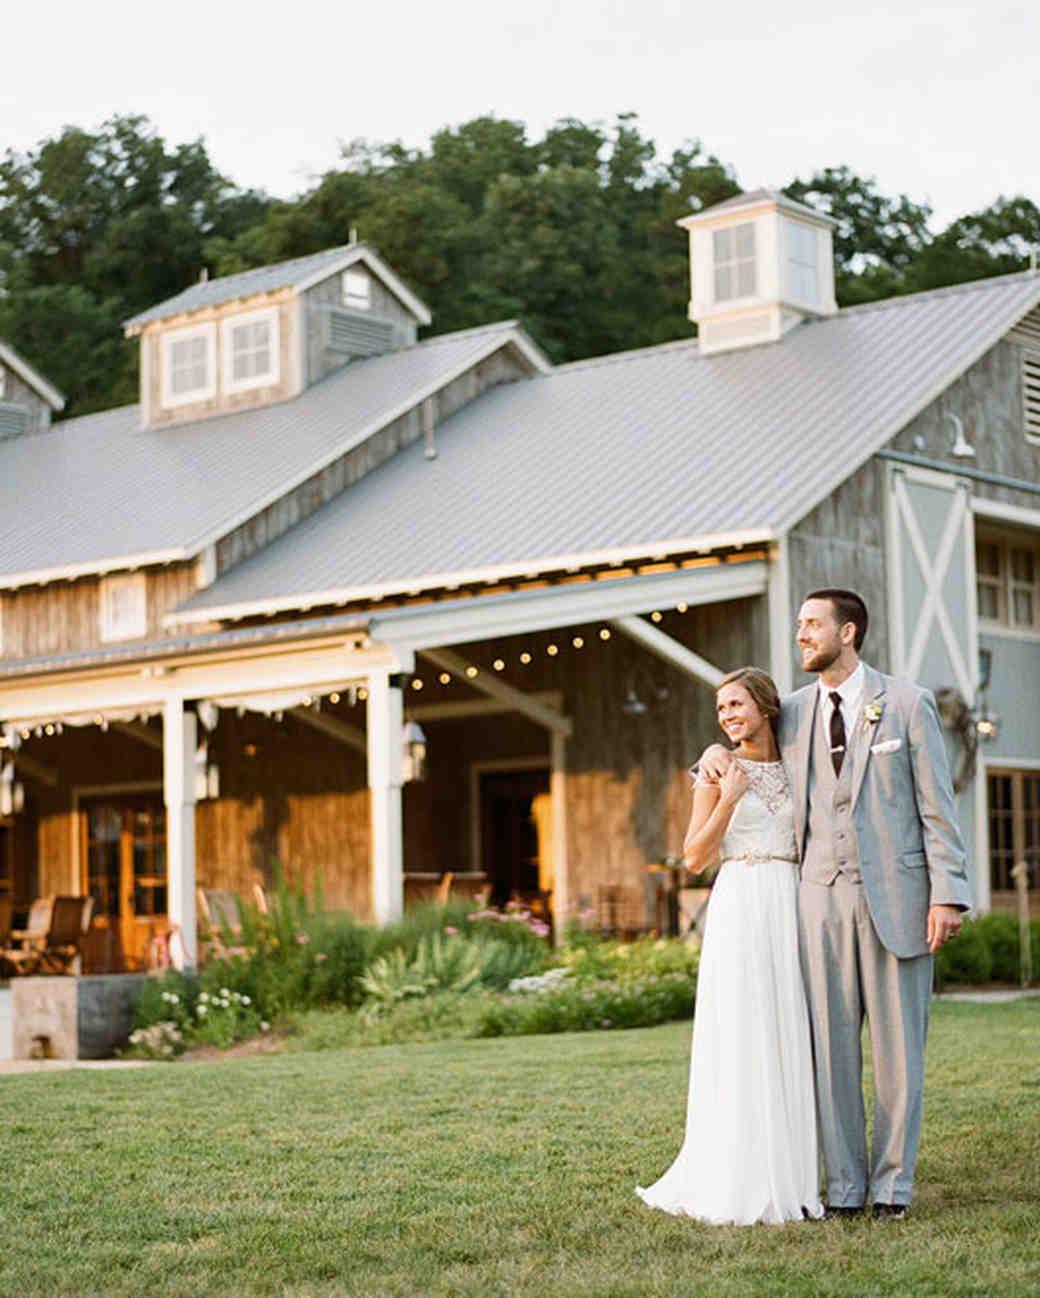 jess-levin-wedding-venue-tips-2-0316.jpg